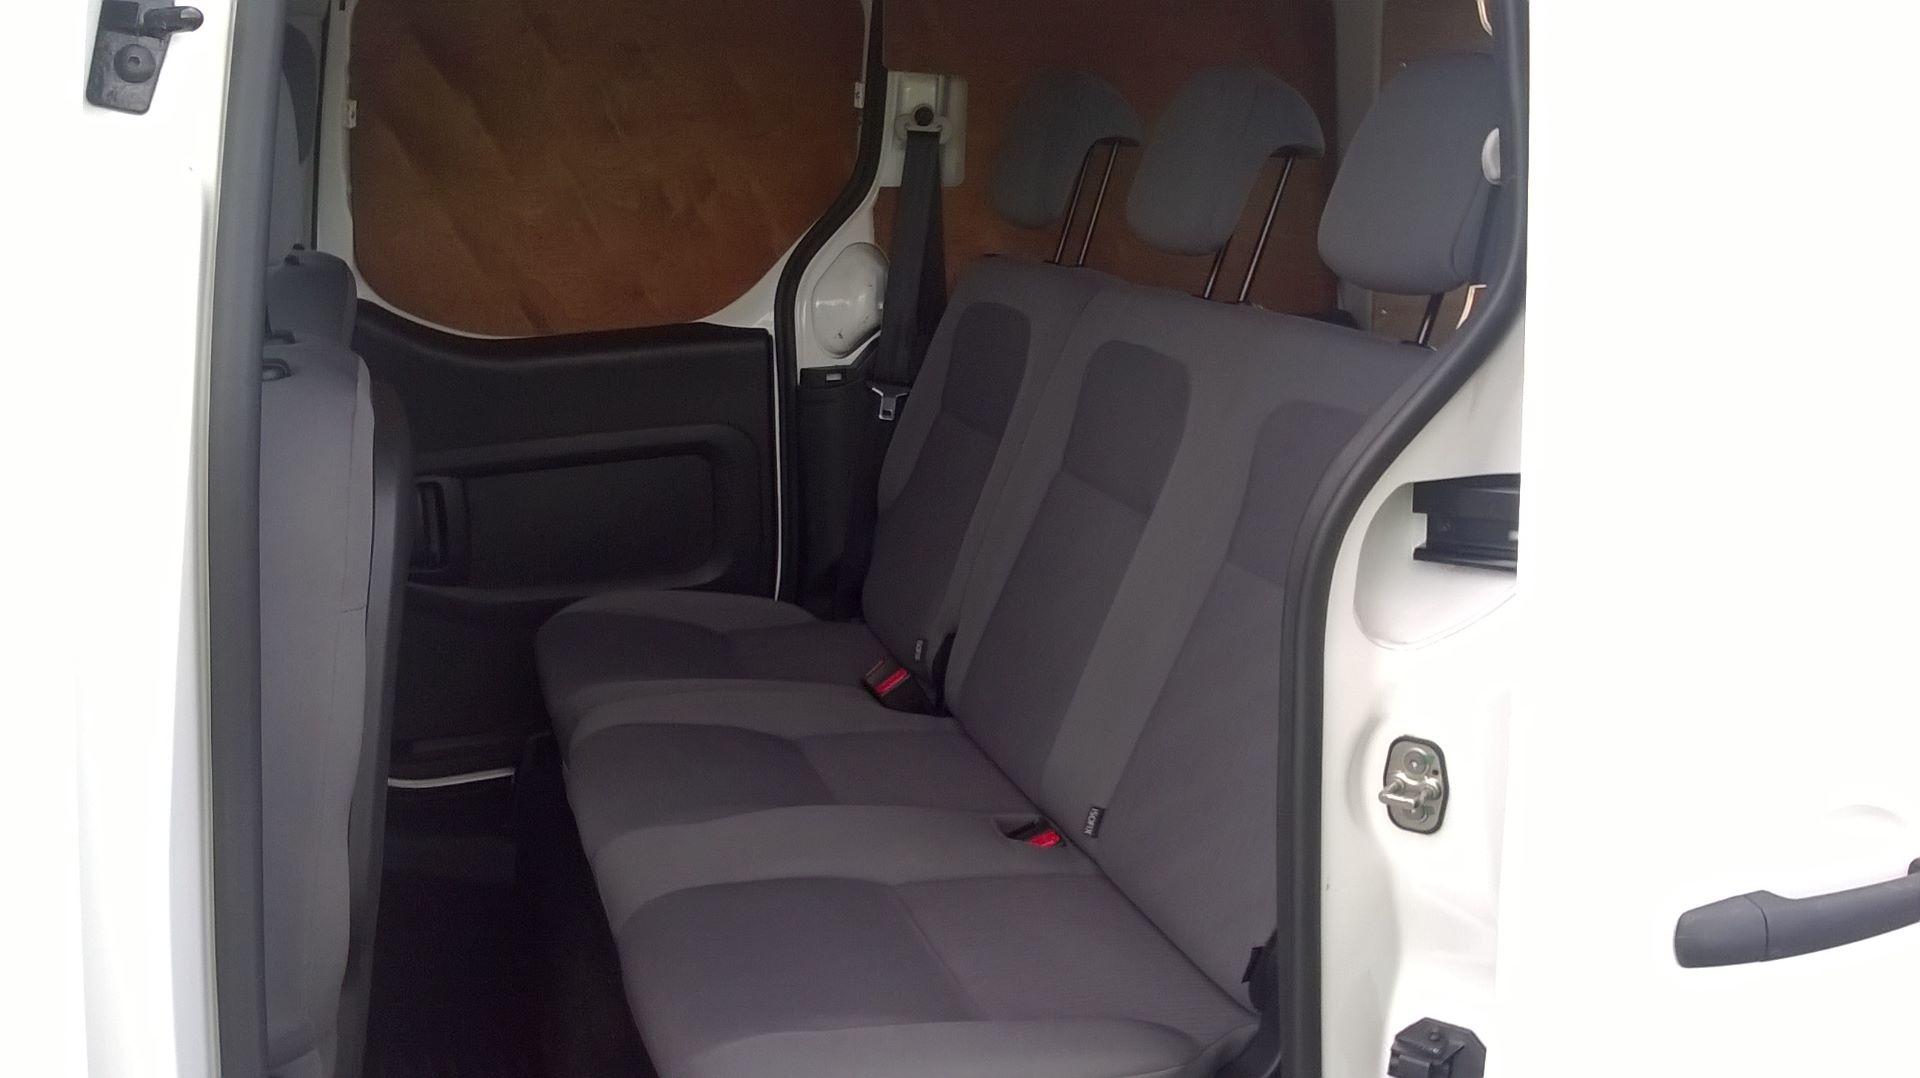 2015 Peugeot Partner 716 S 1.6 Hdi 92 Crew Van (NU65VBX) Image 11